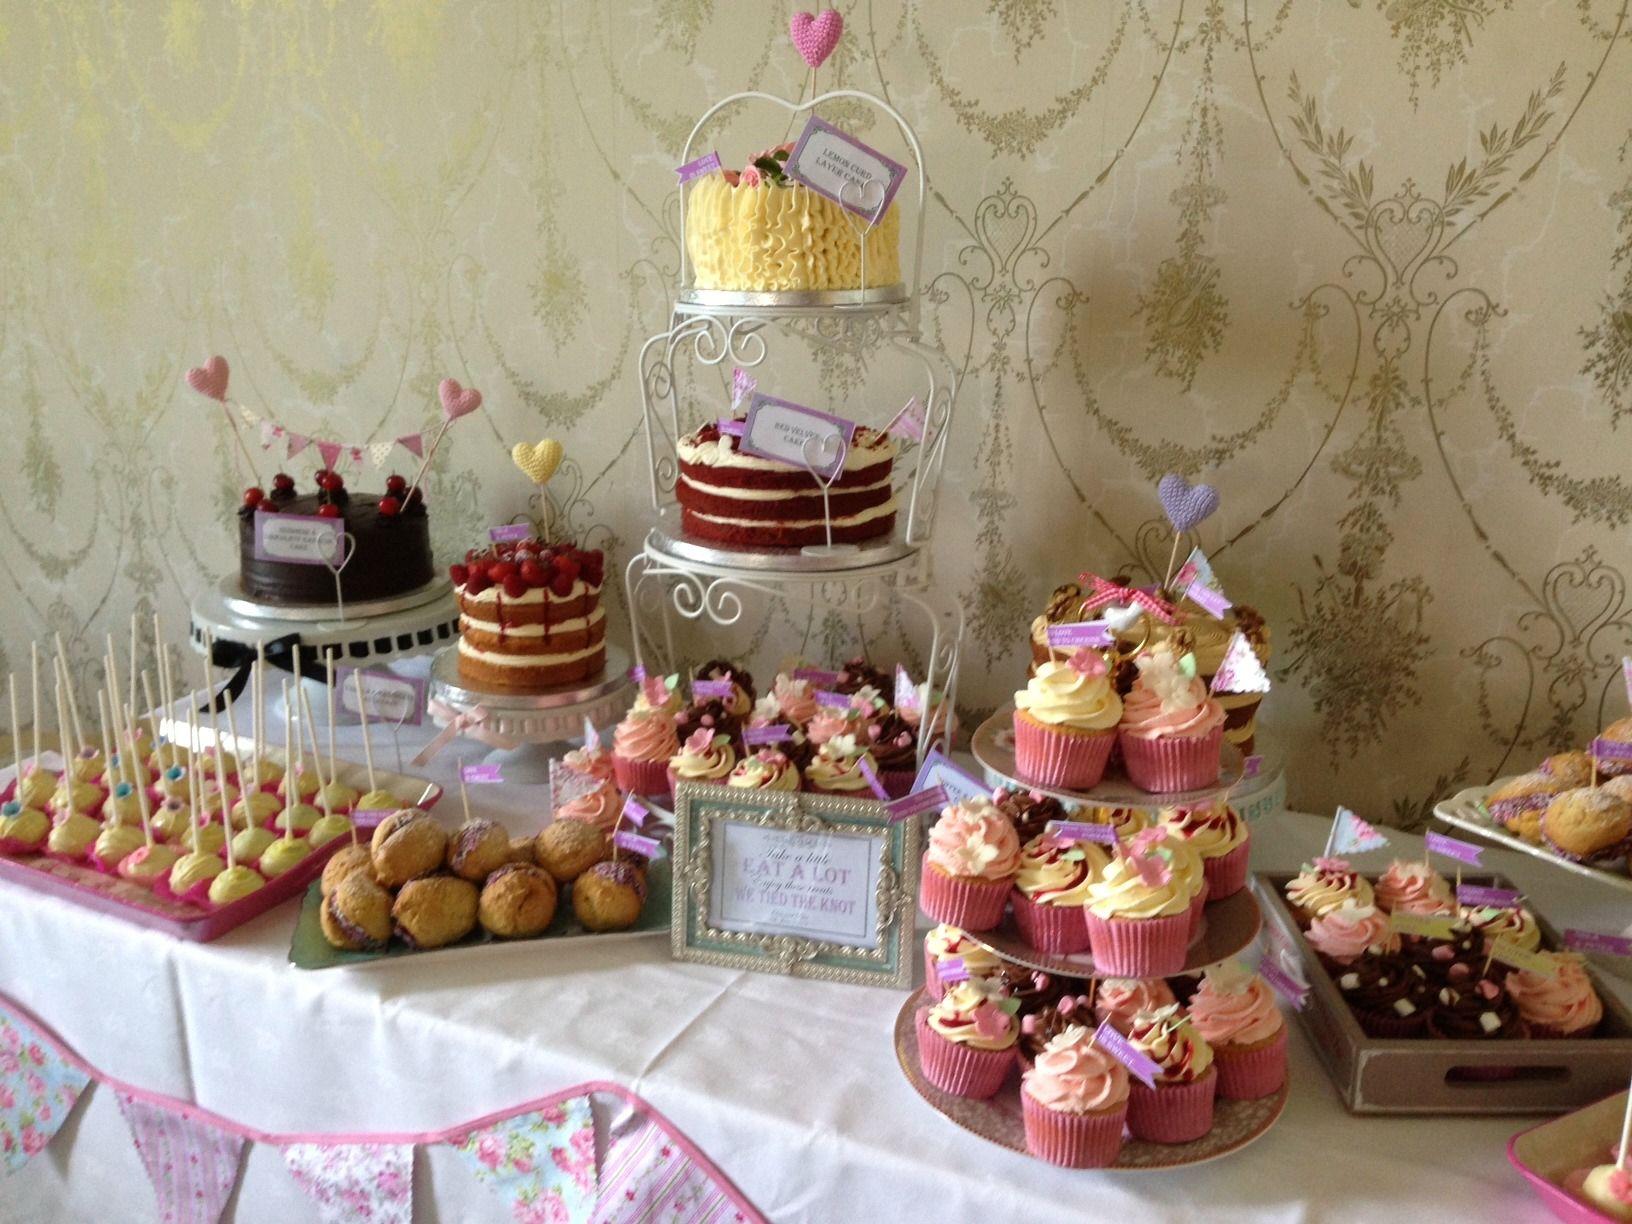 Kelly Lou Cakes wedding dessert table cakes